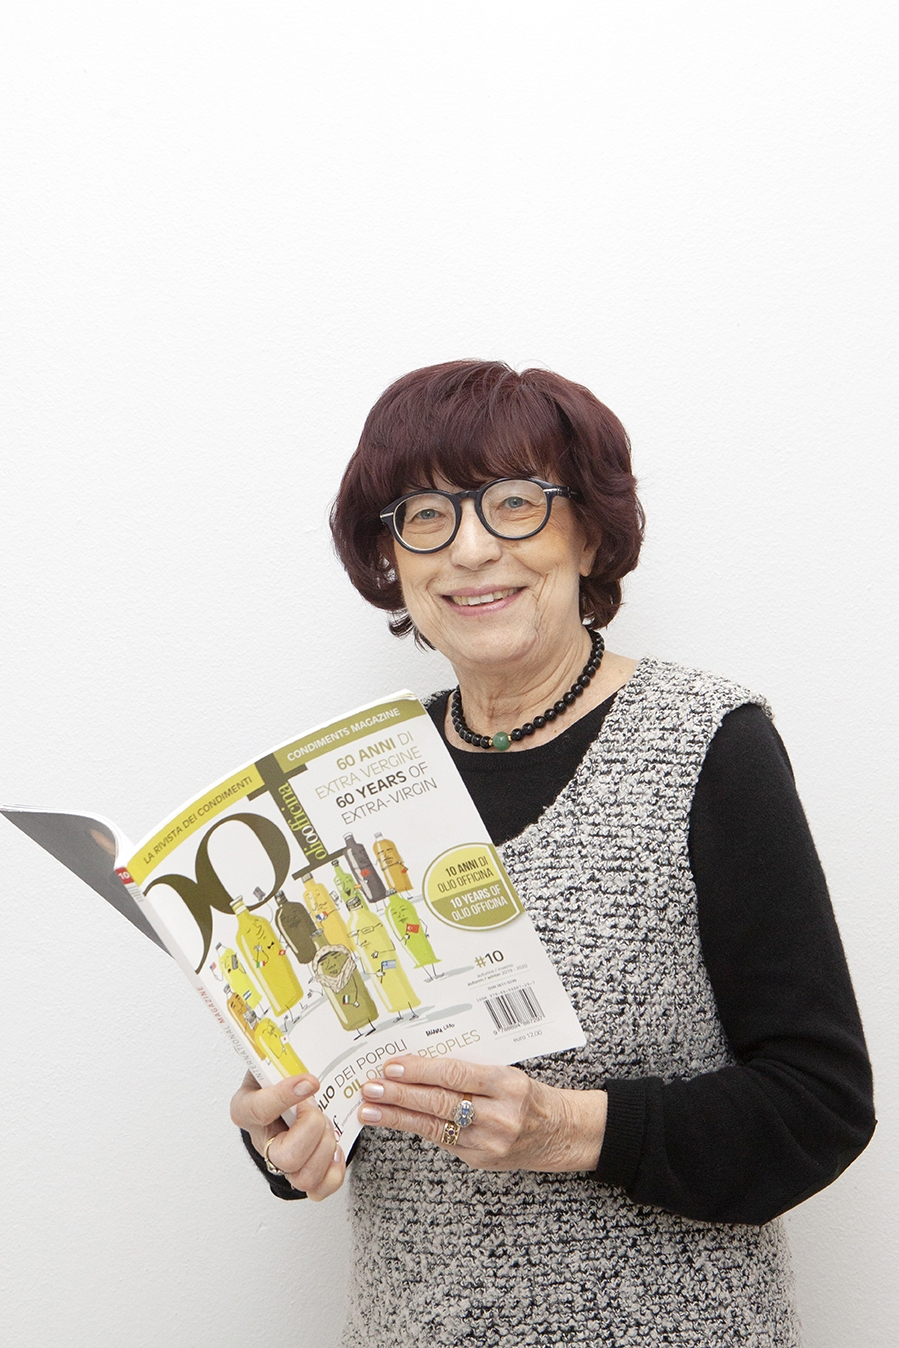 Le buone letture di Marisa Fumagalli